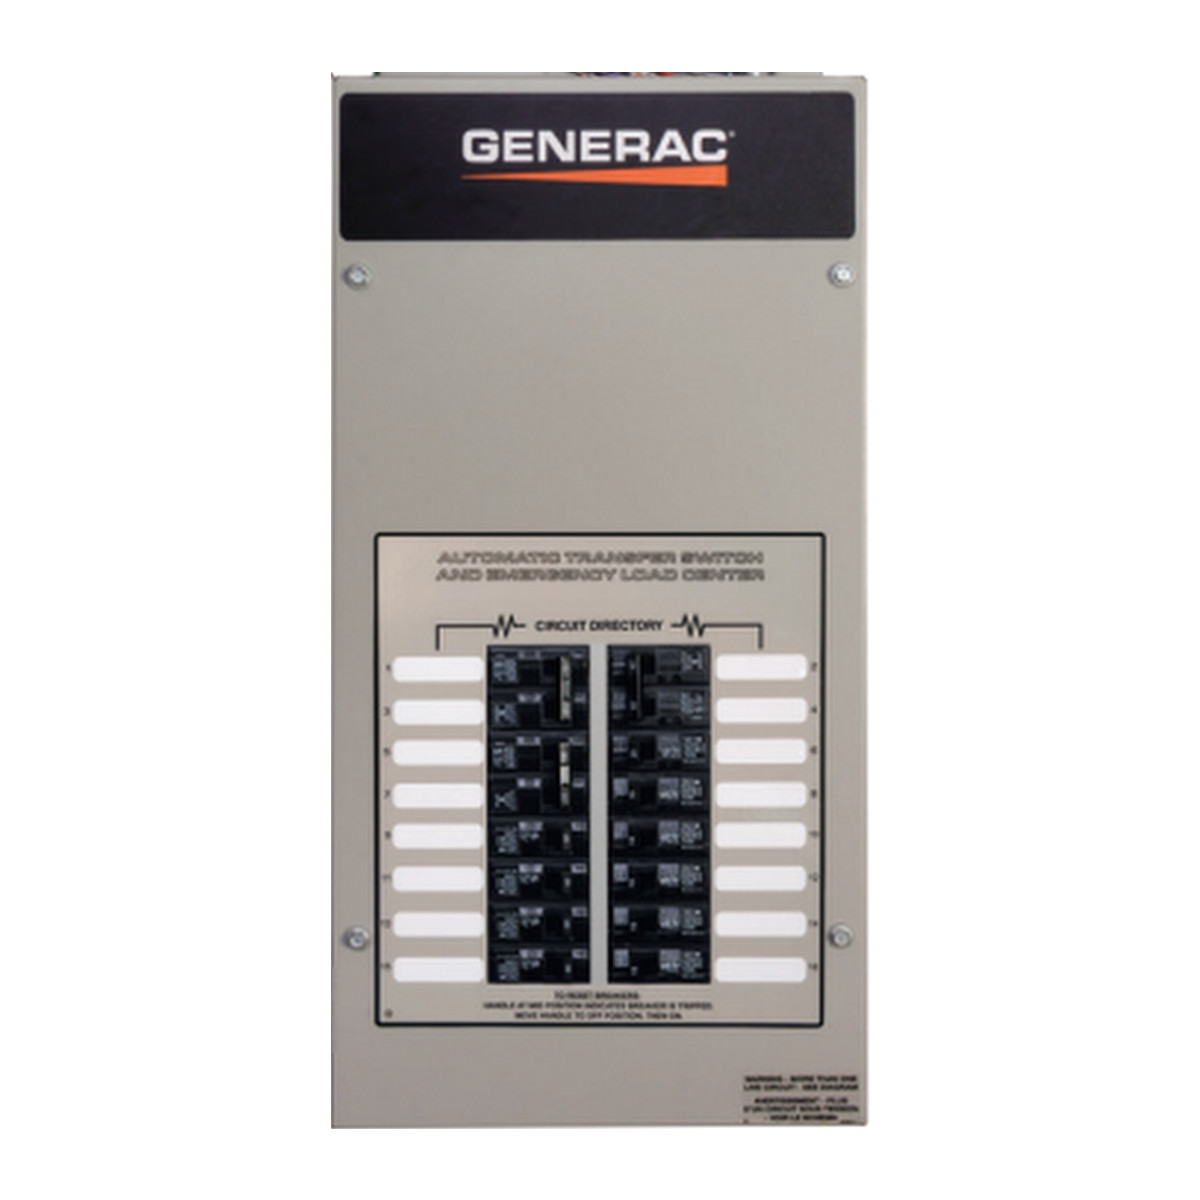 RXG16EZA1 Generac 100A 16-circuit Transfer Switch w/Load Center KitAP Electric Generators